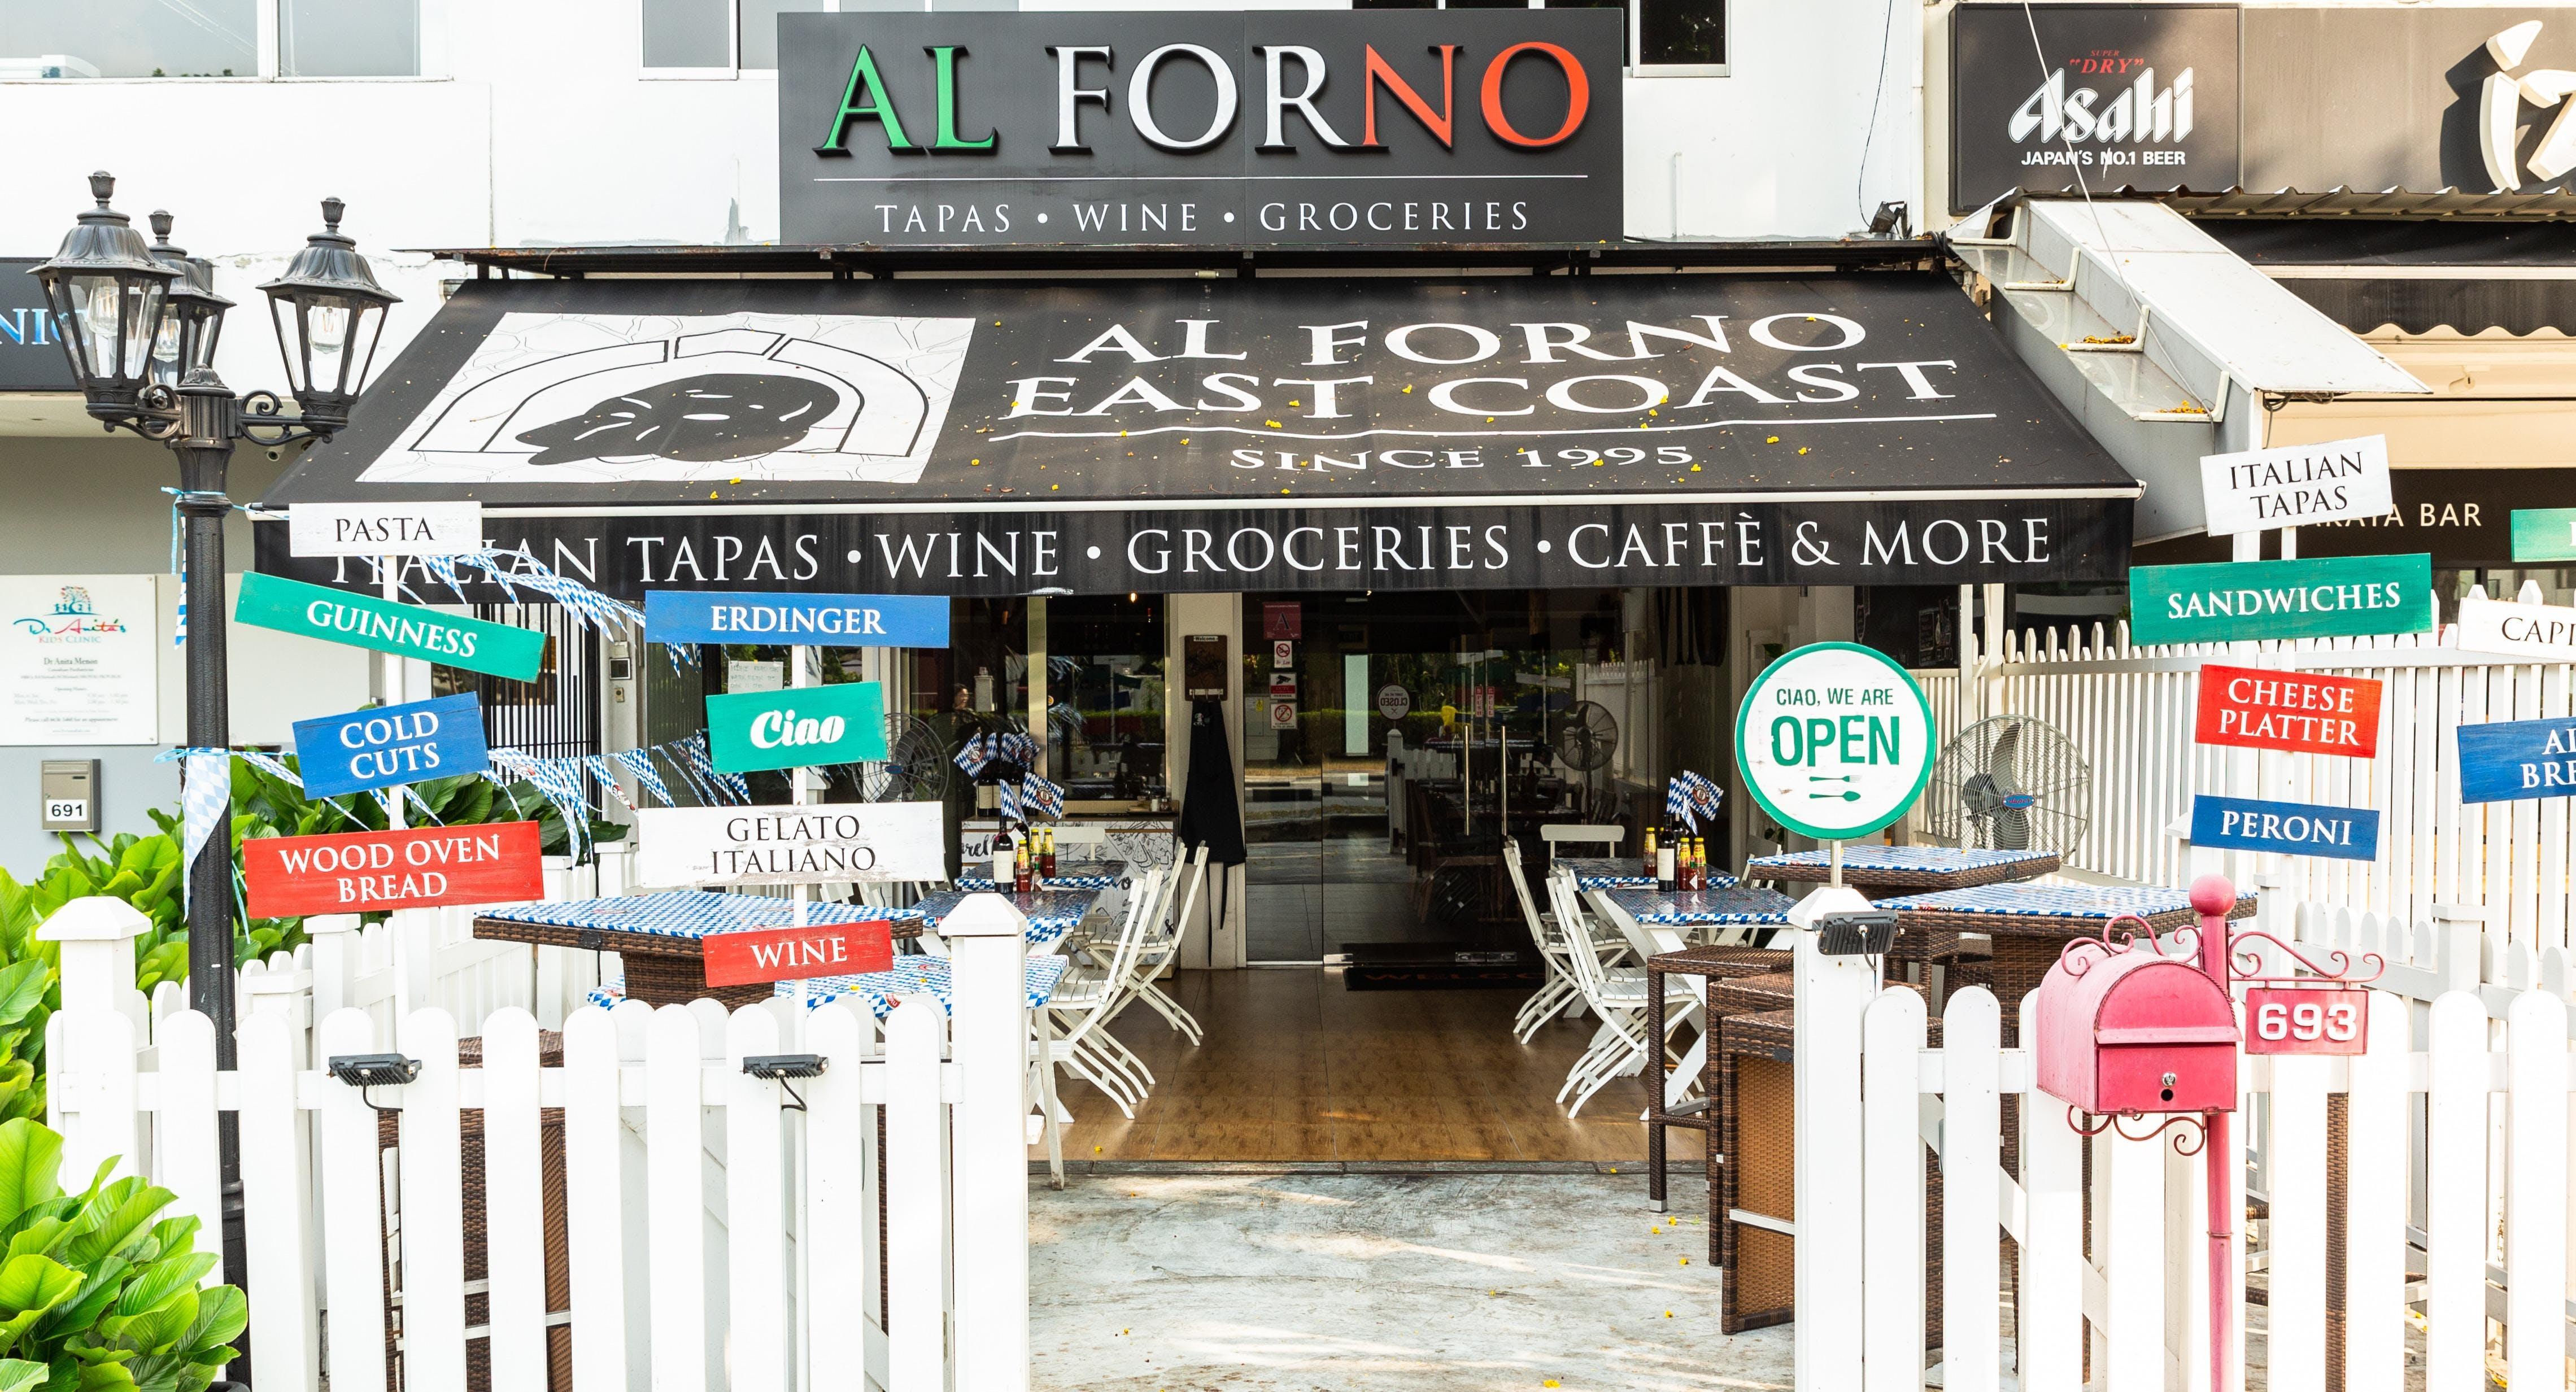 Al Forno Tapas & Wine Bar Singapore image 2